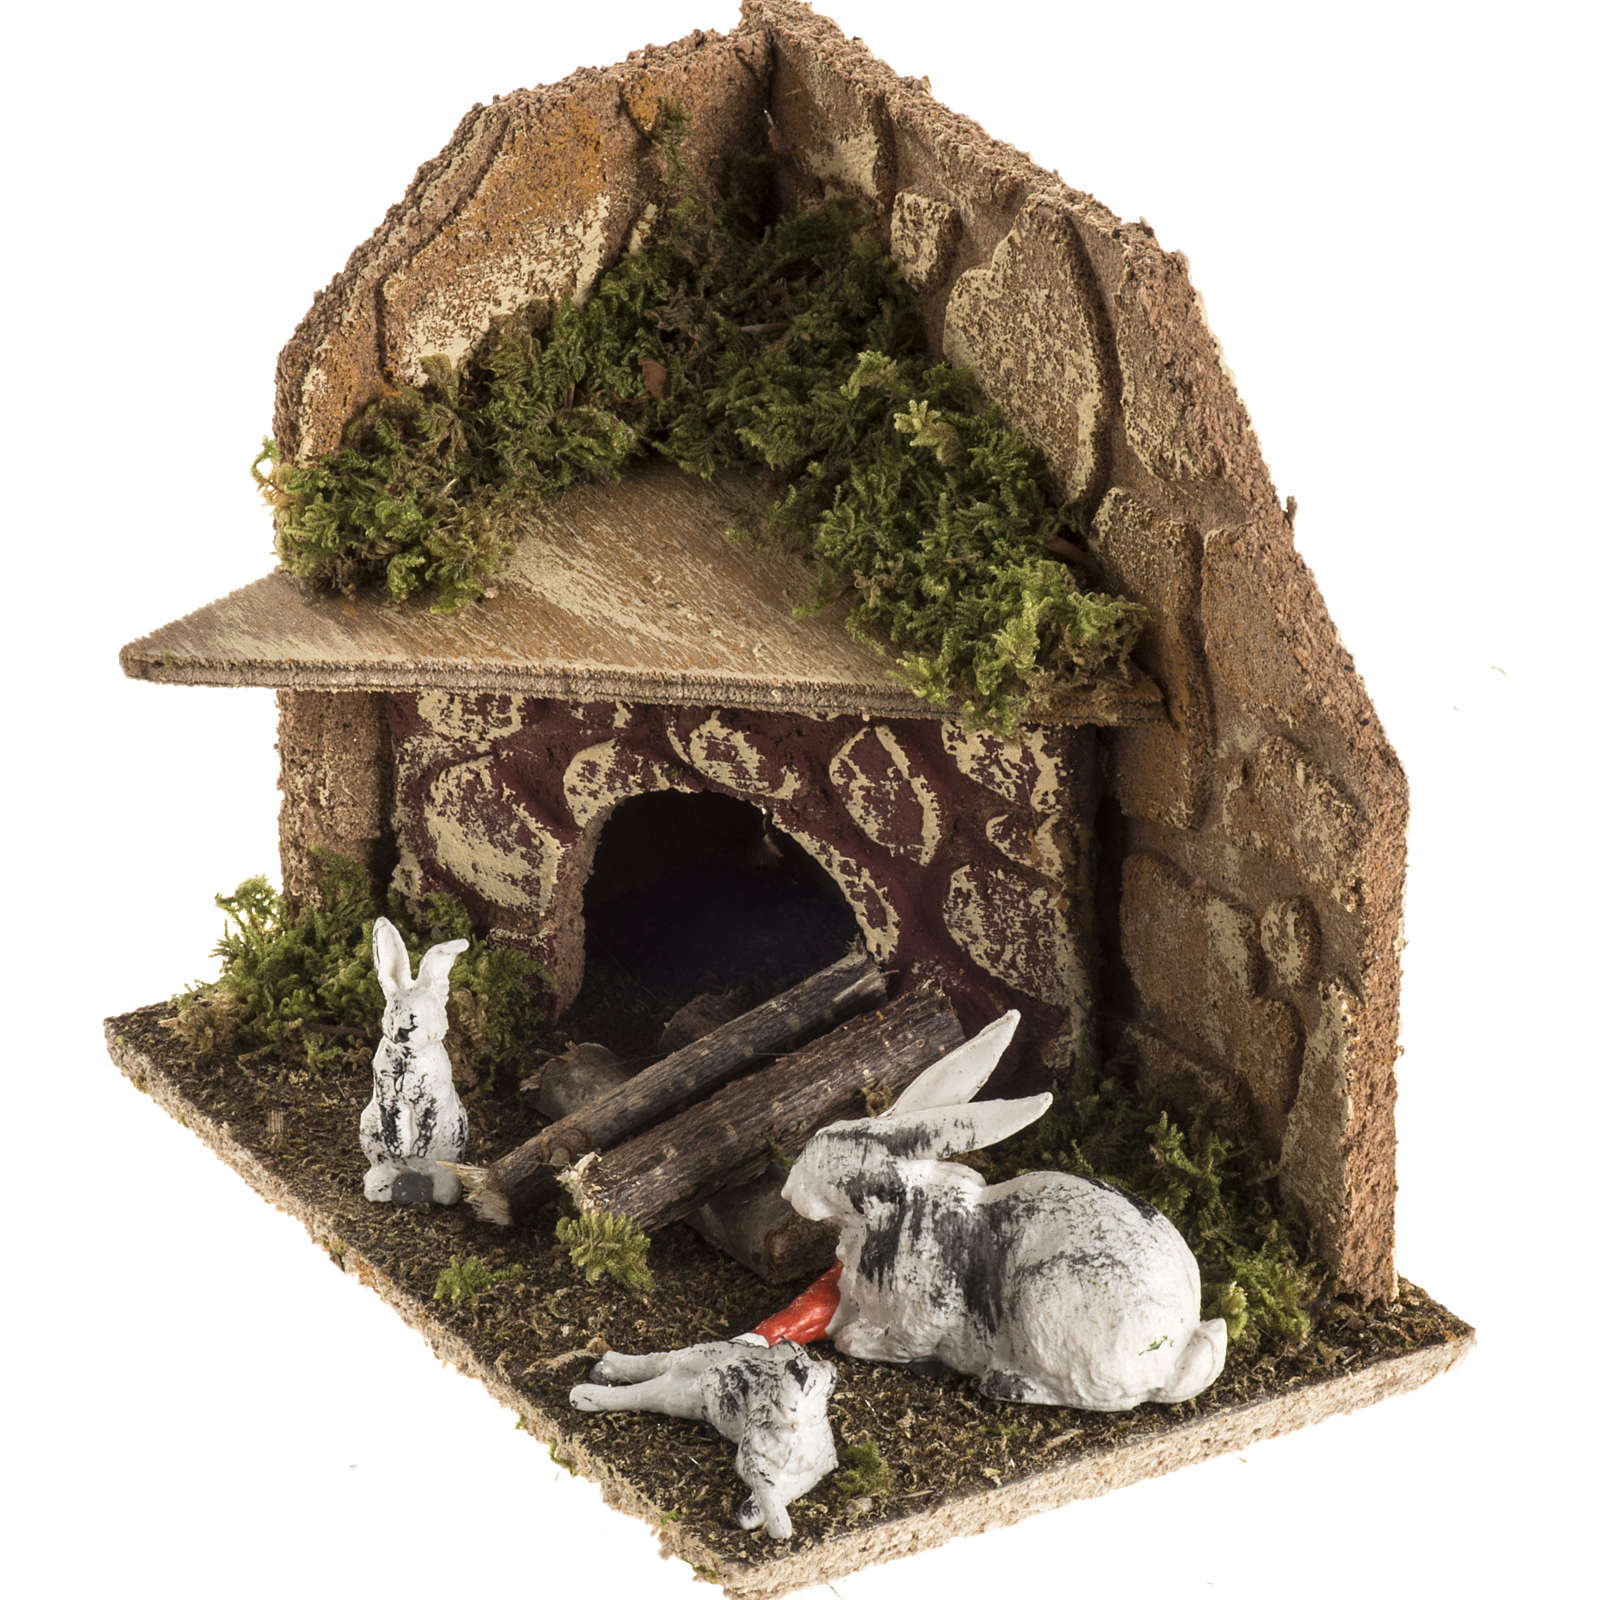 Nativity scene figurines, rabbits with rabbit hutch 3